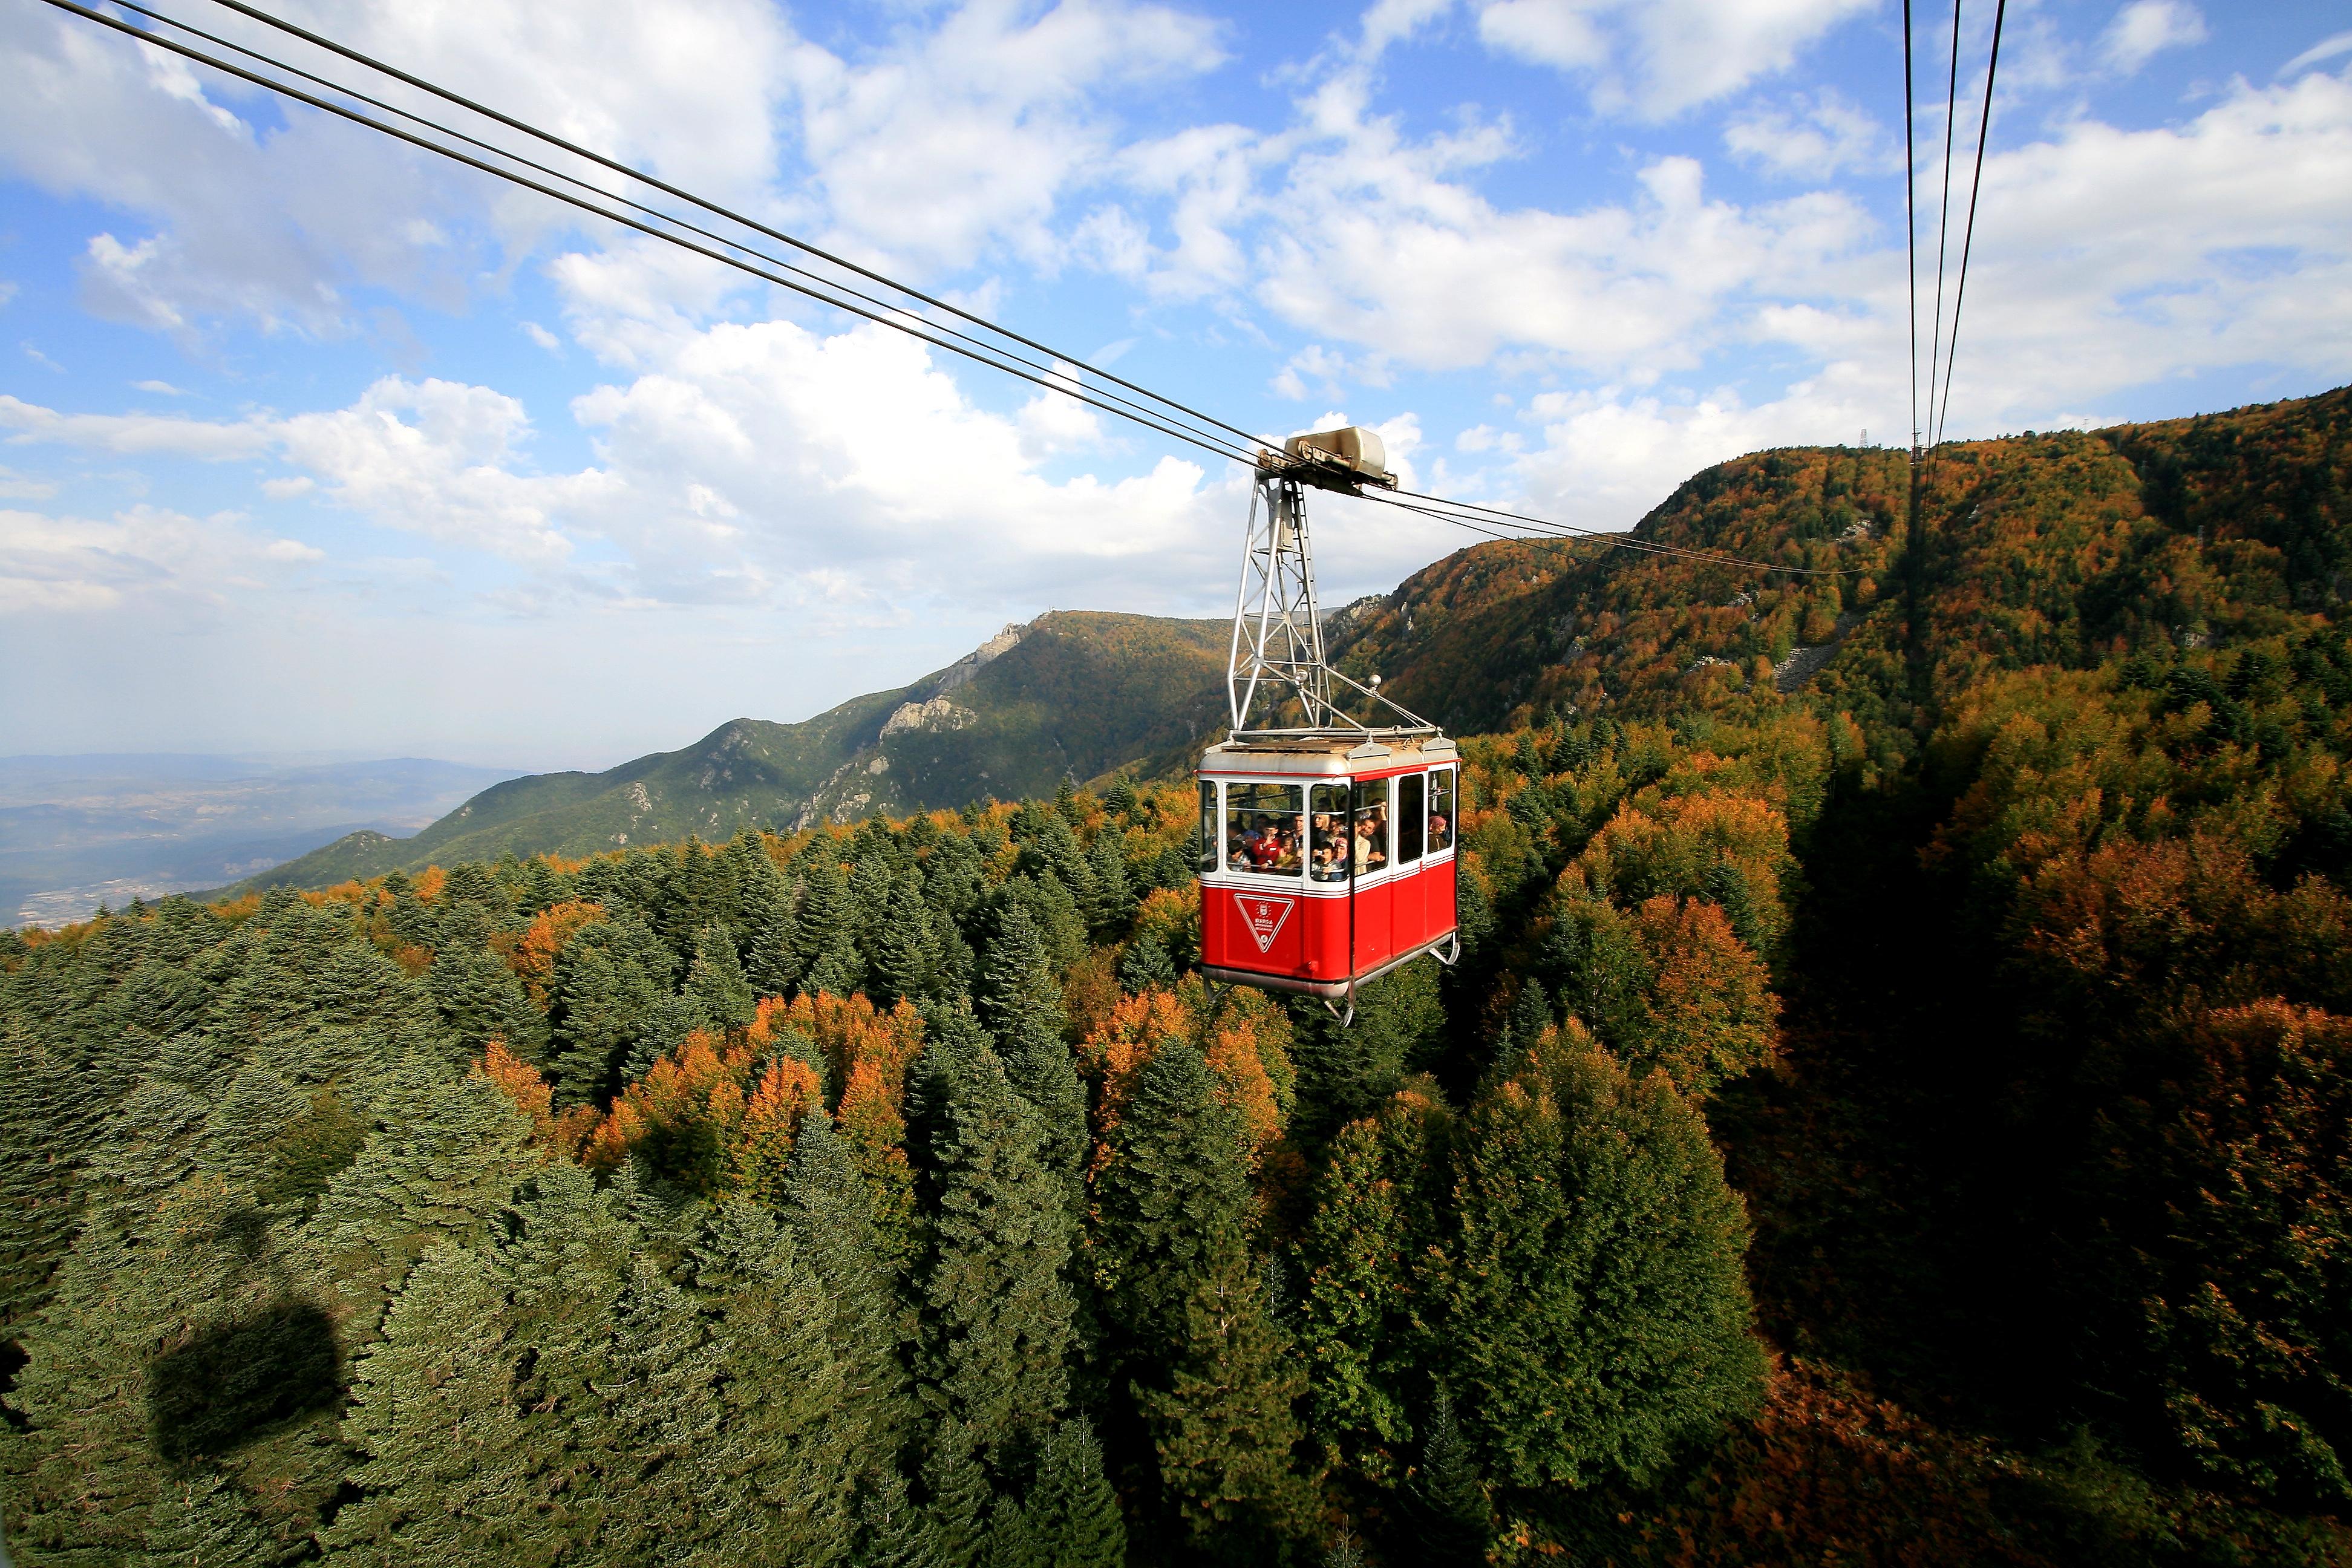 File:Teleferik, Uludağ.jpg - Wikimedia Commons